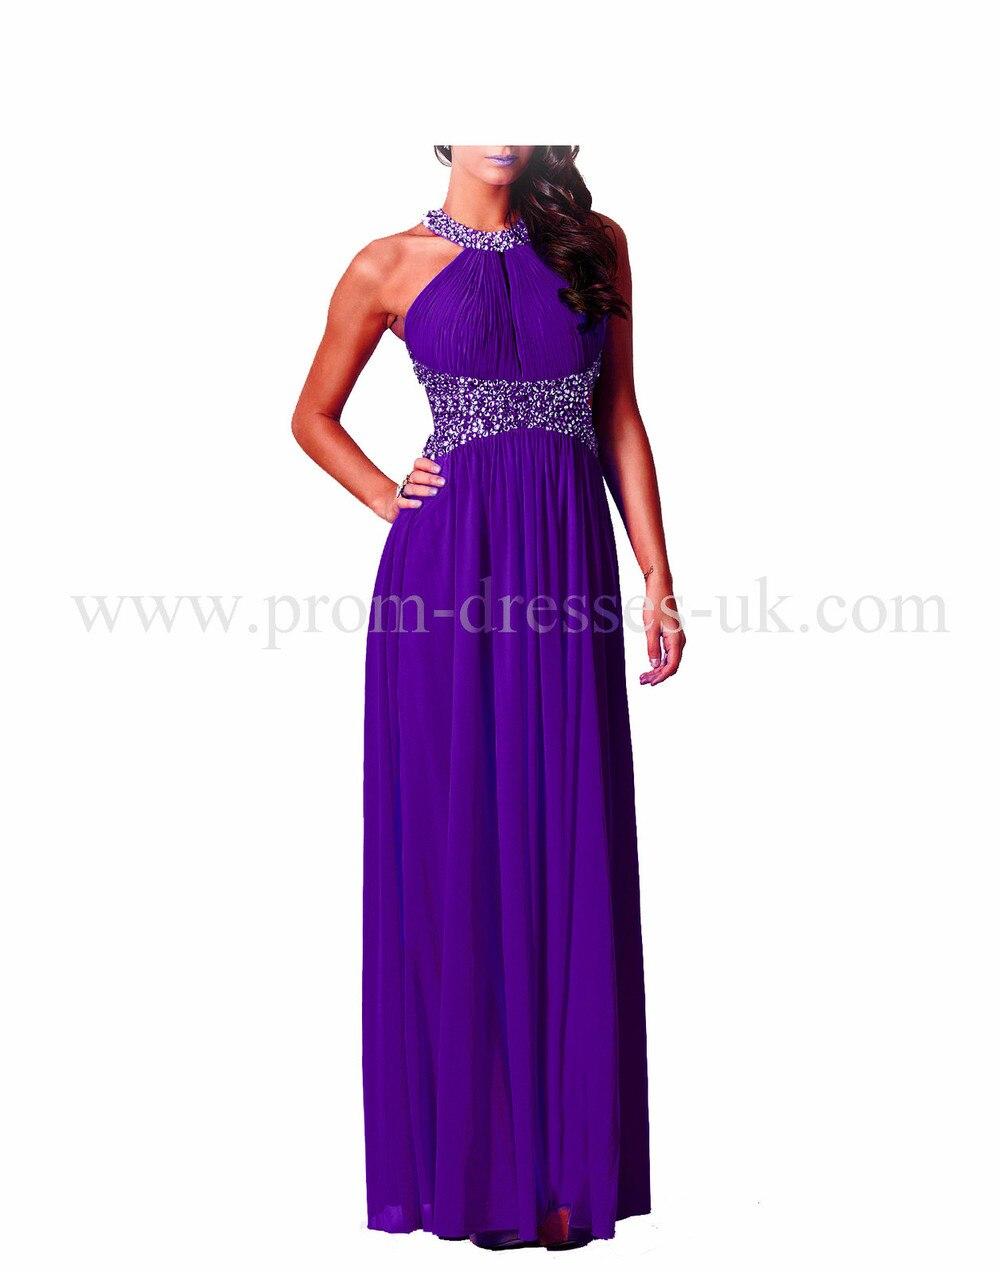 vestido de festa longo prom gown crystal beading pleat 2018 hot sexy backless chiffon long robe de soiree bridesmaid dresses